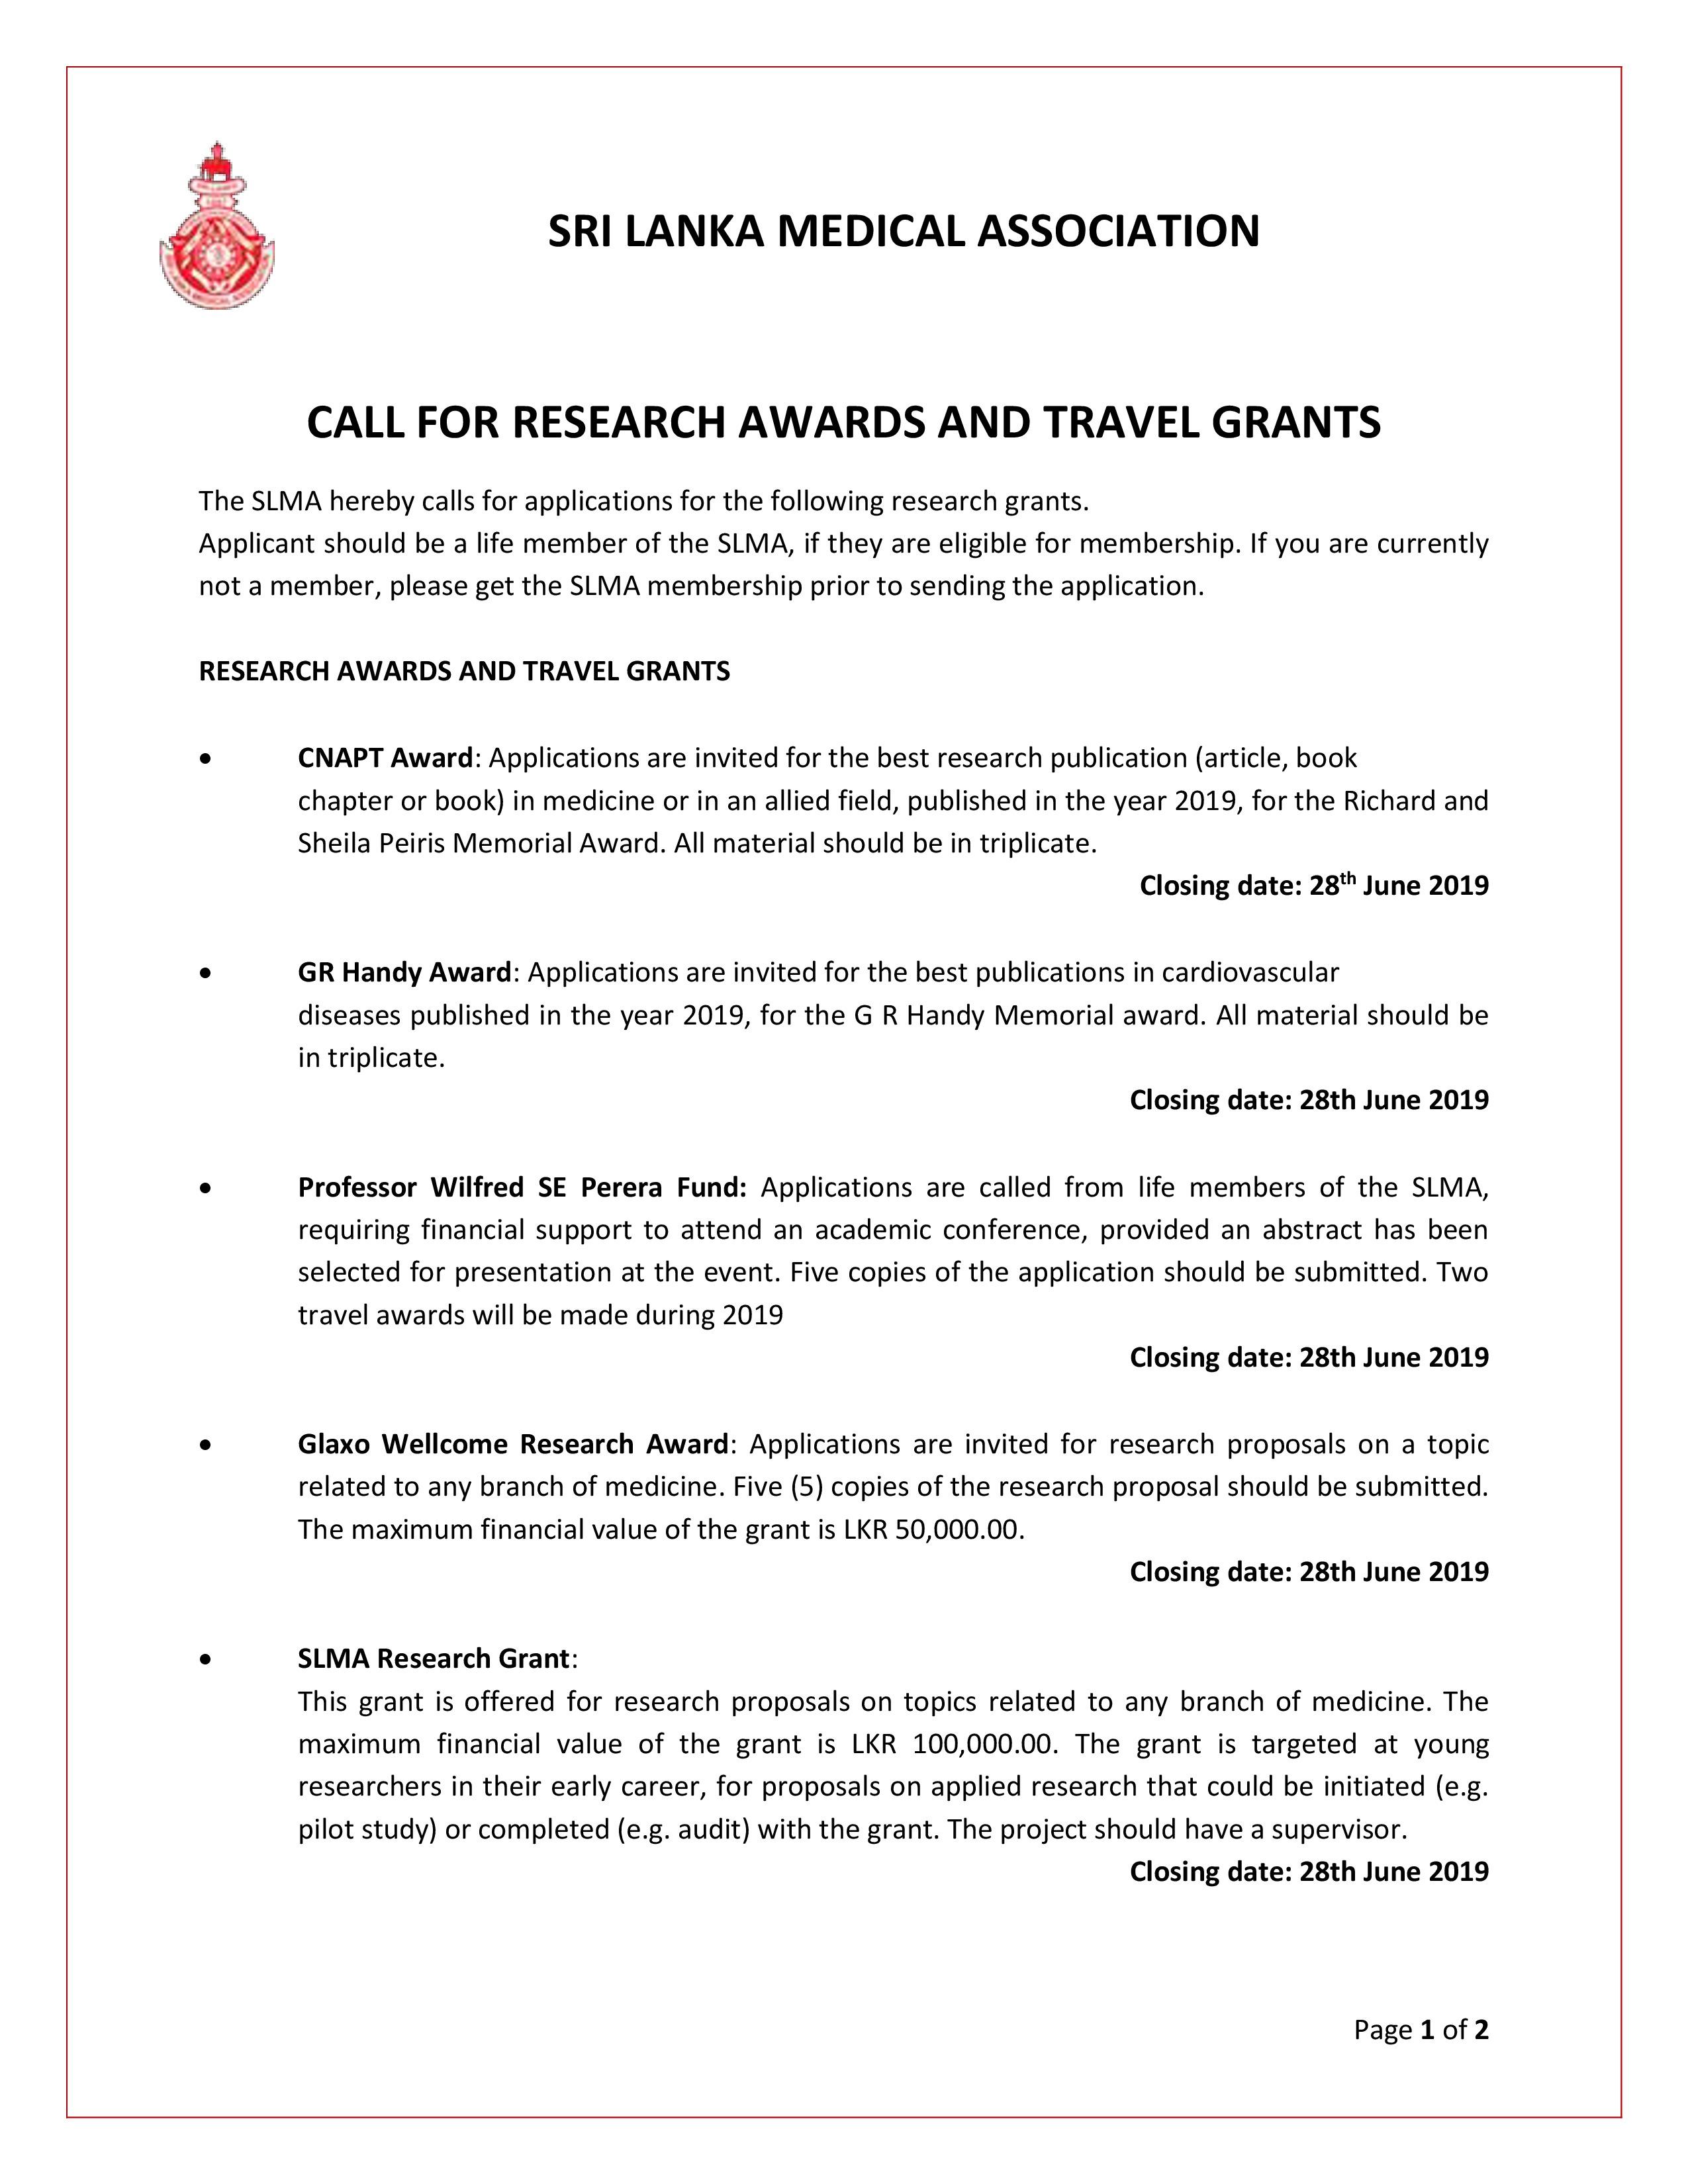 Research Awards And Grants The Sri Lanka Medical Association Slma